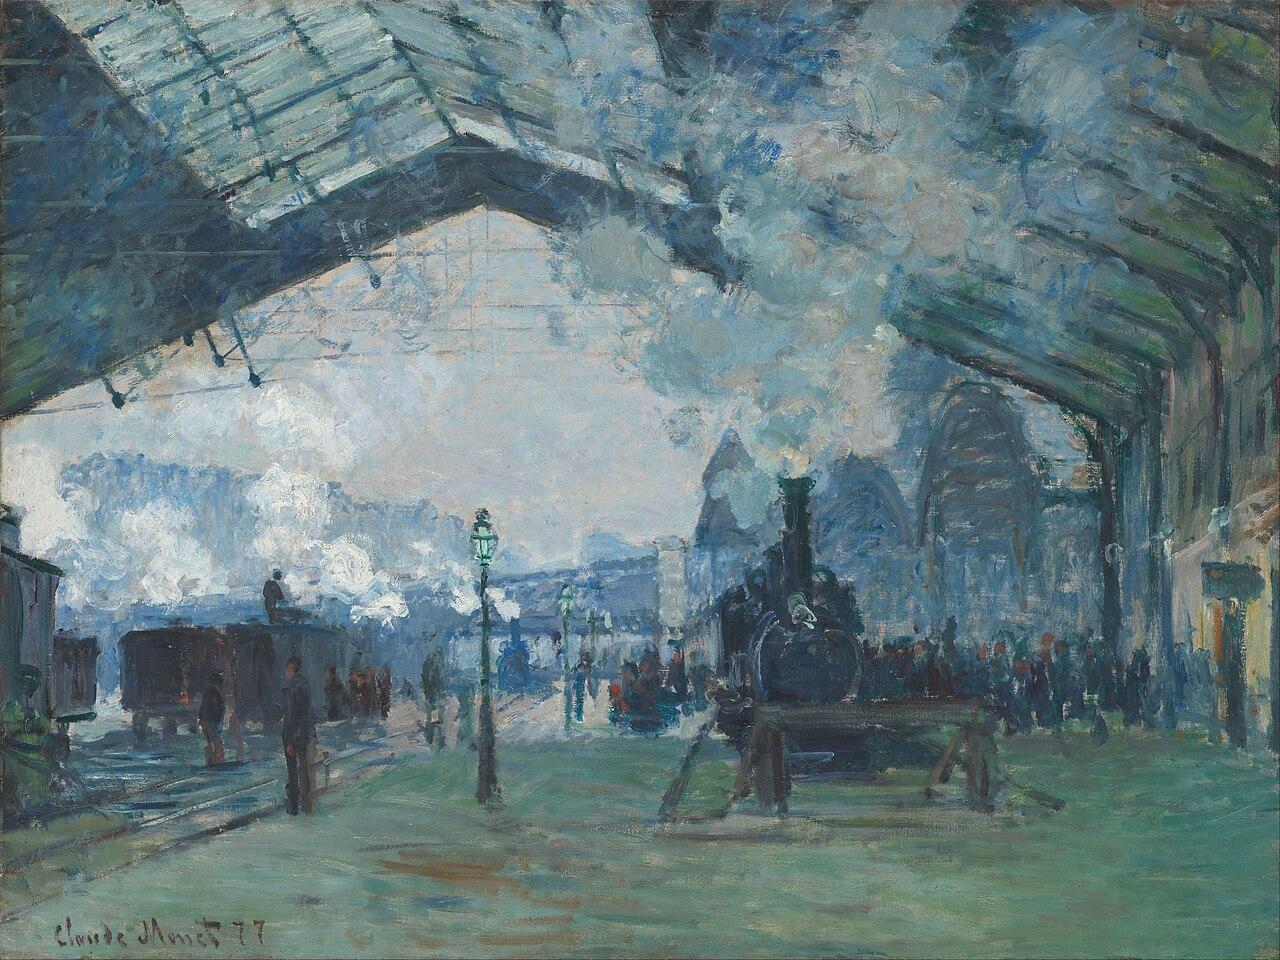 Image: Claude Monet. Arrival of the Normandy Train, Gare Saint-Lazare, 1877.